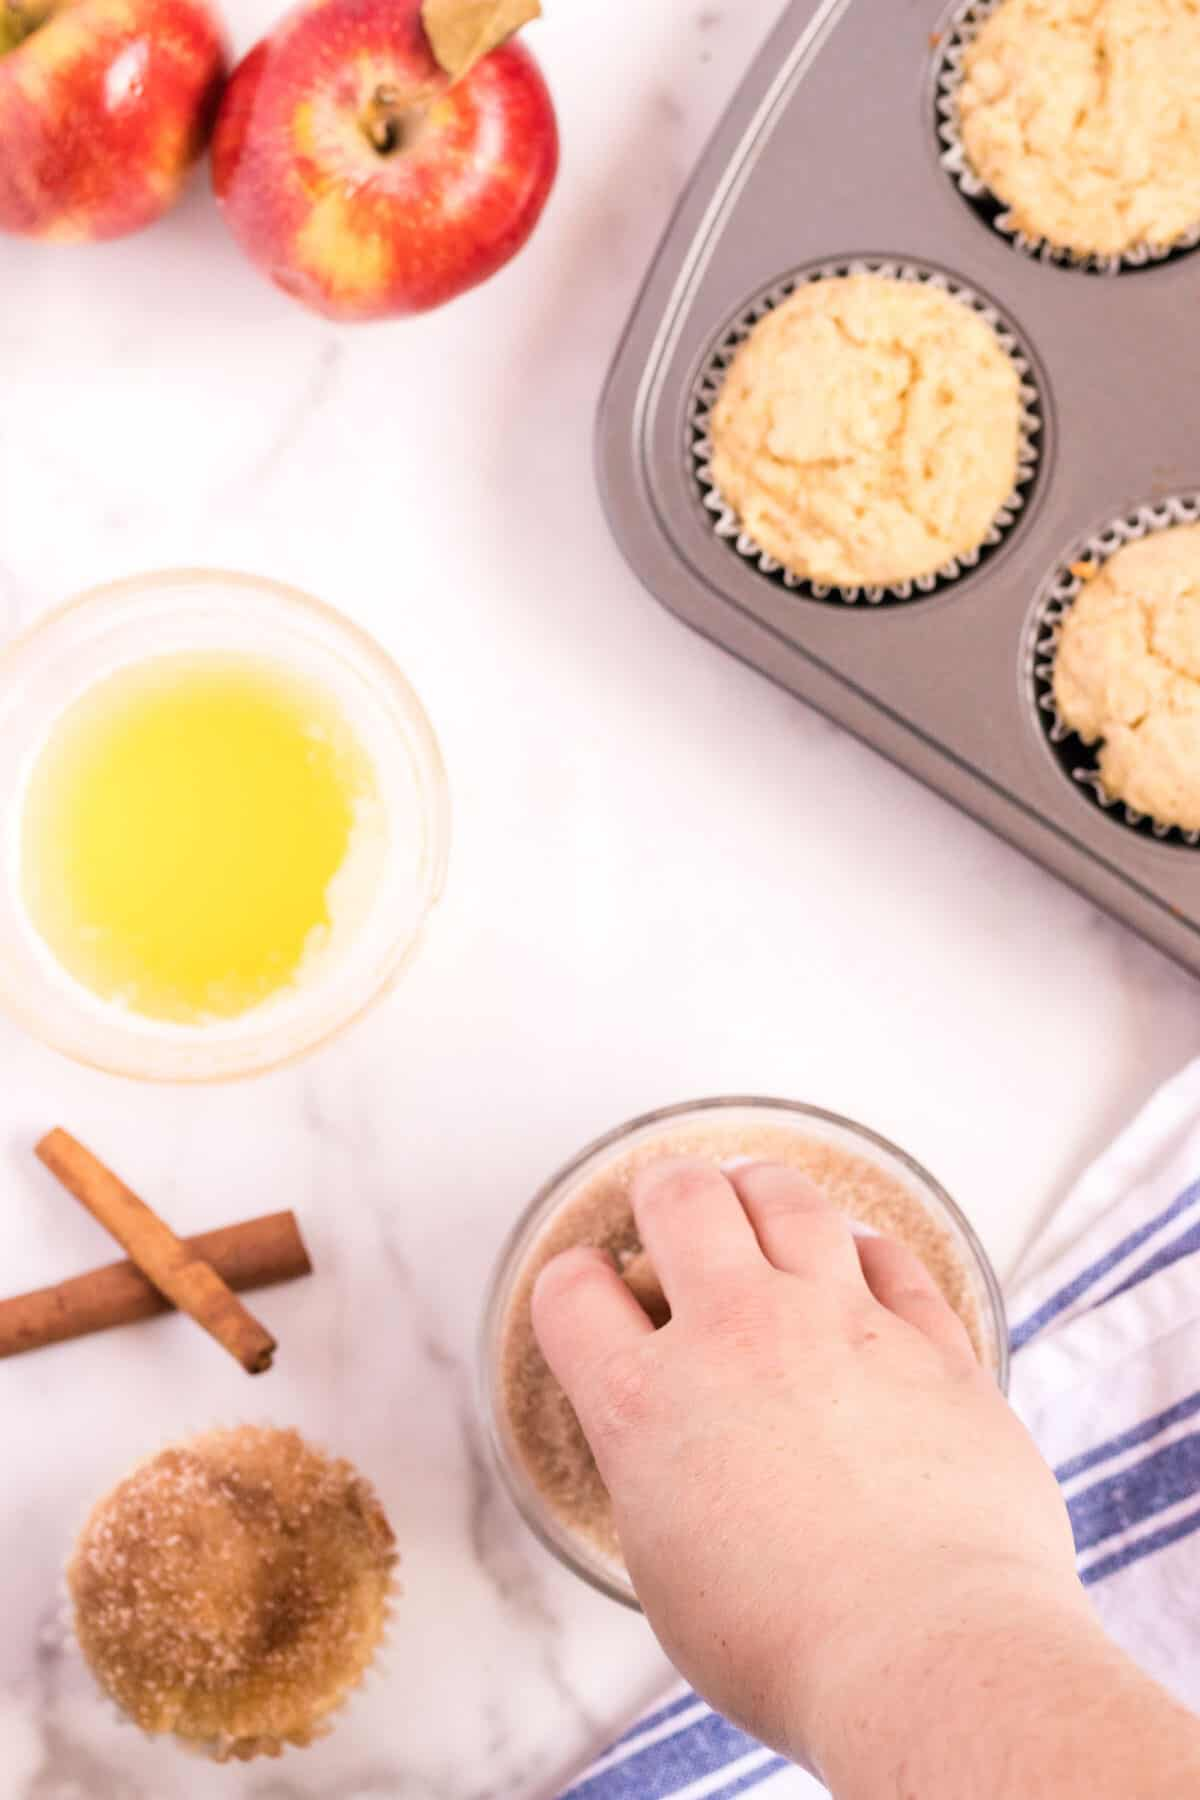 hand dipping muffins into cinnamon sugar